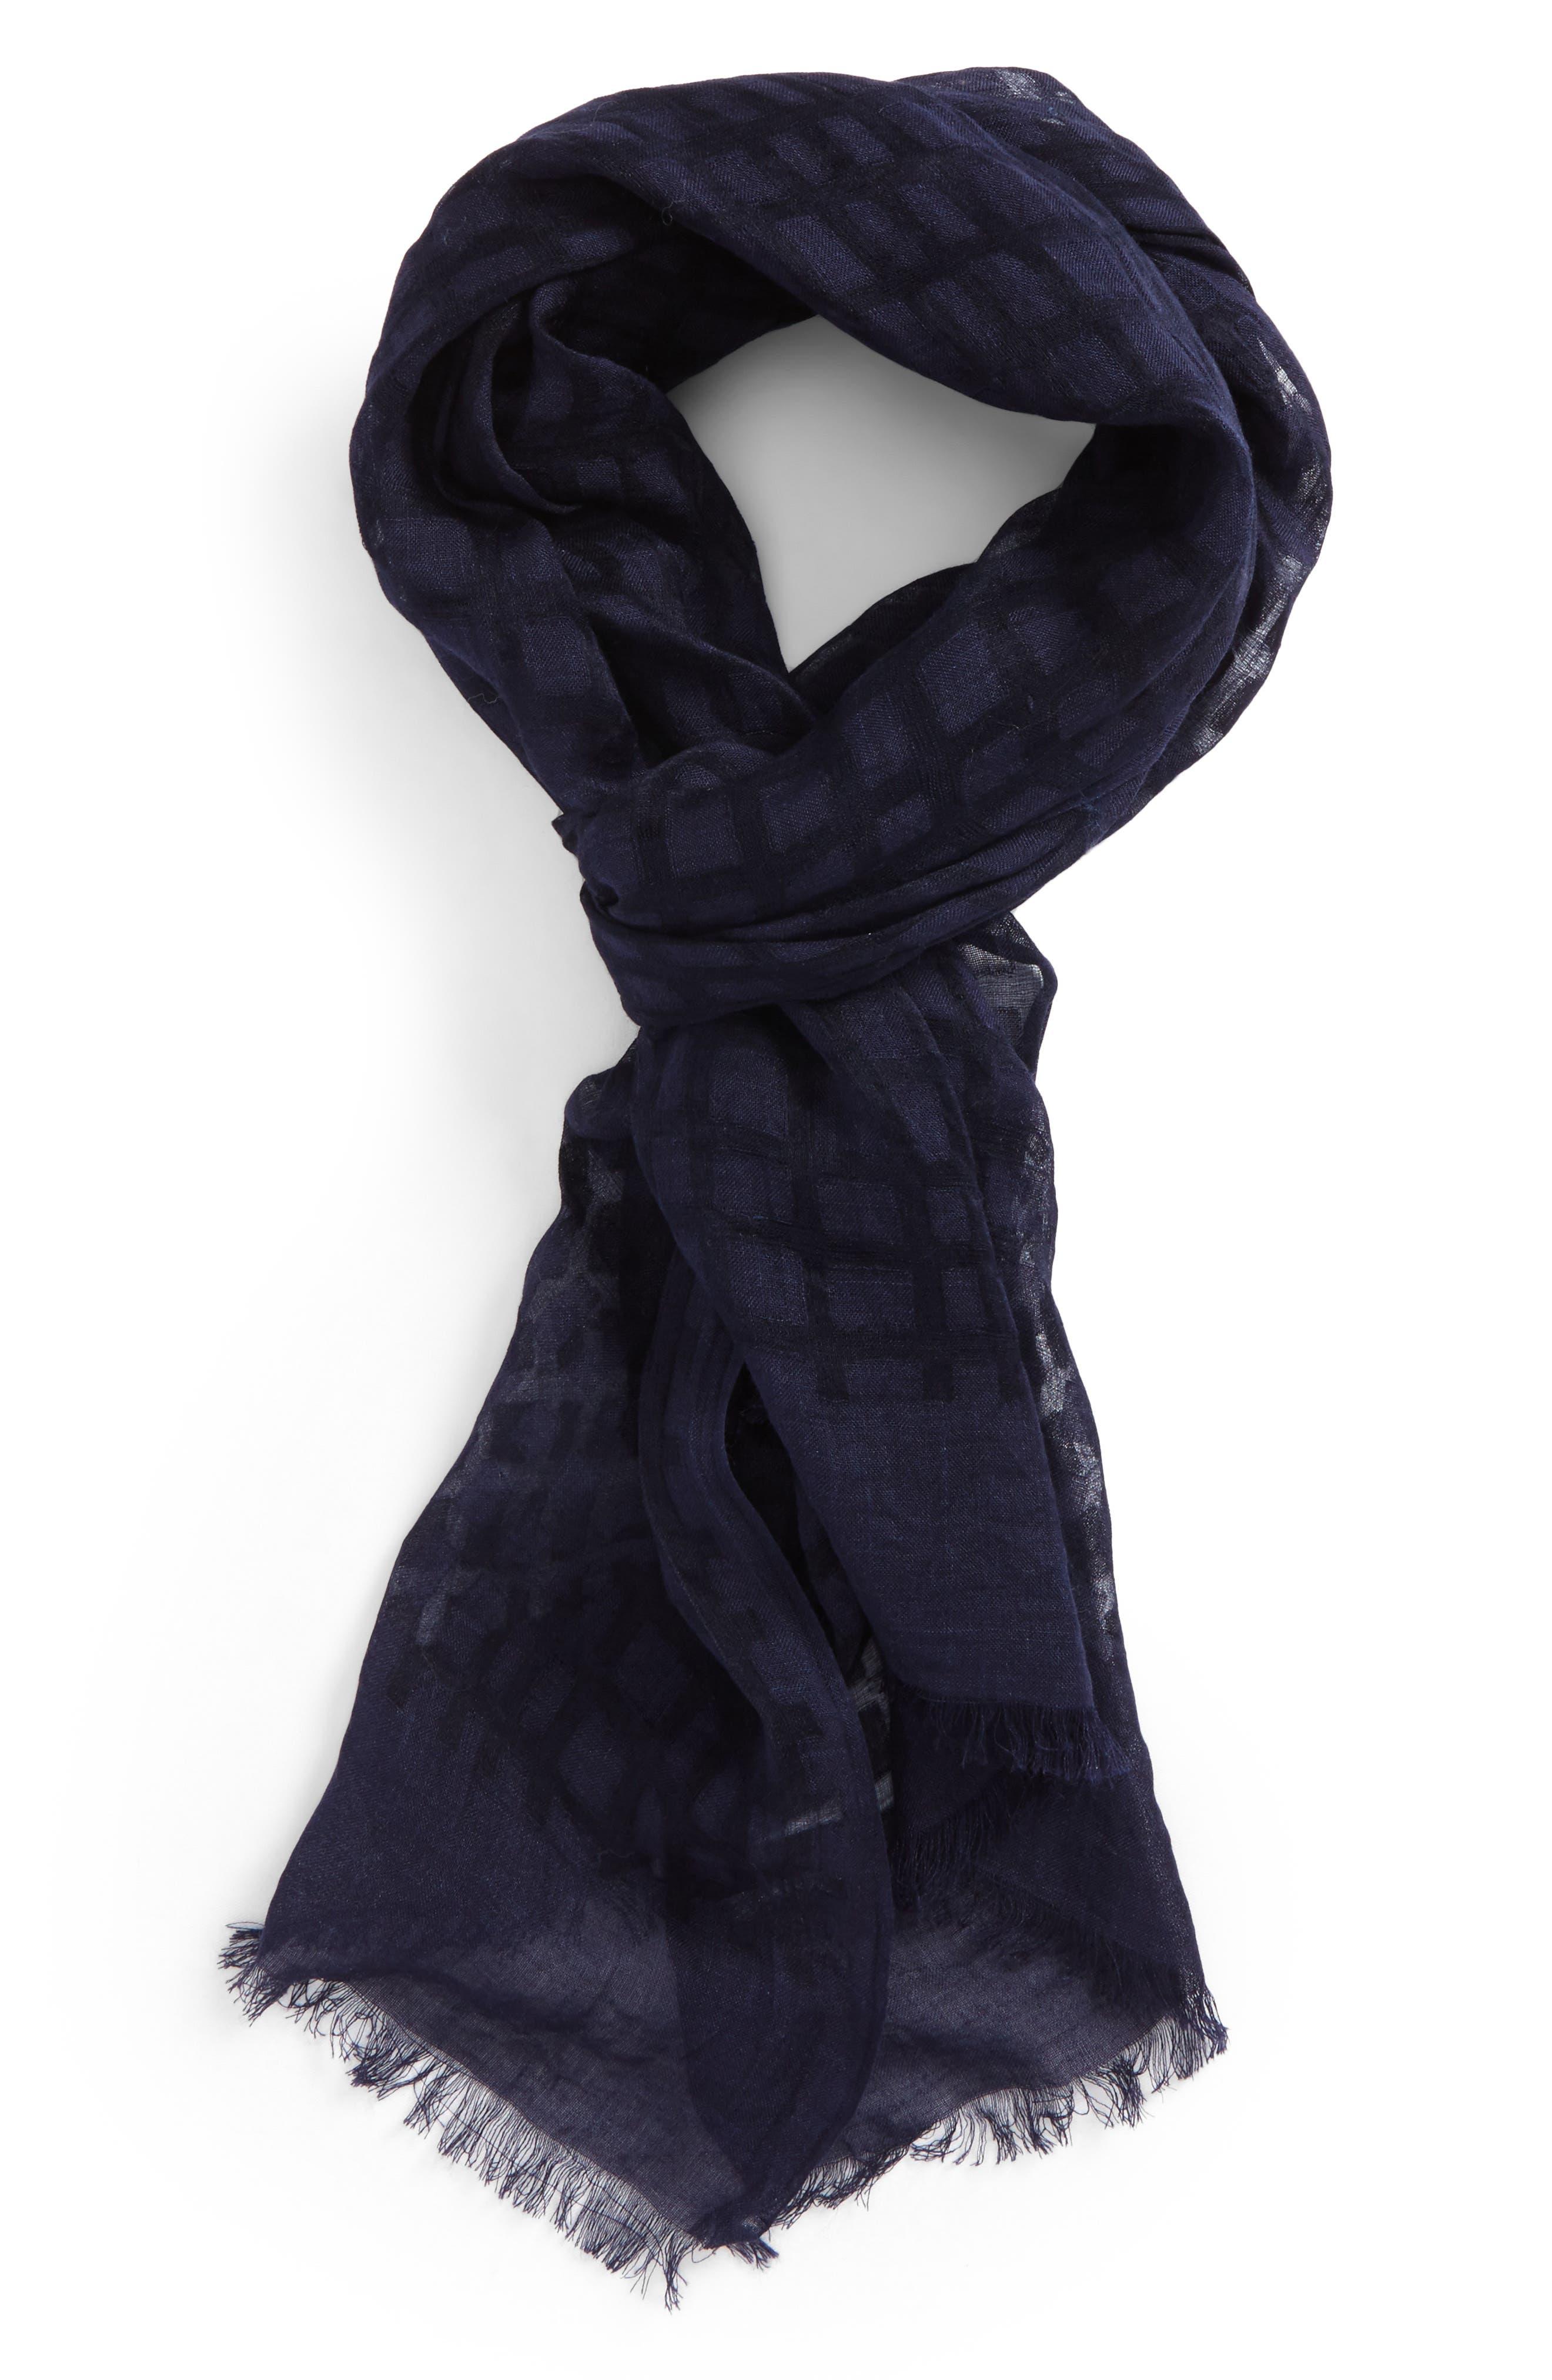 Y's by Yohji Yamamoto Plaid Silk & Linen Scarf